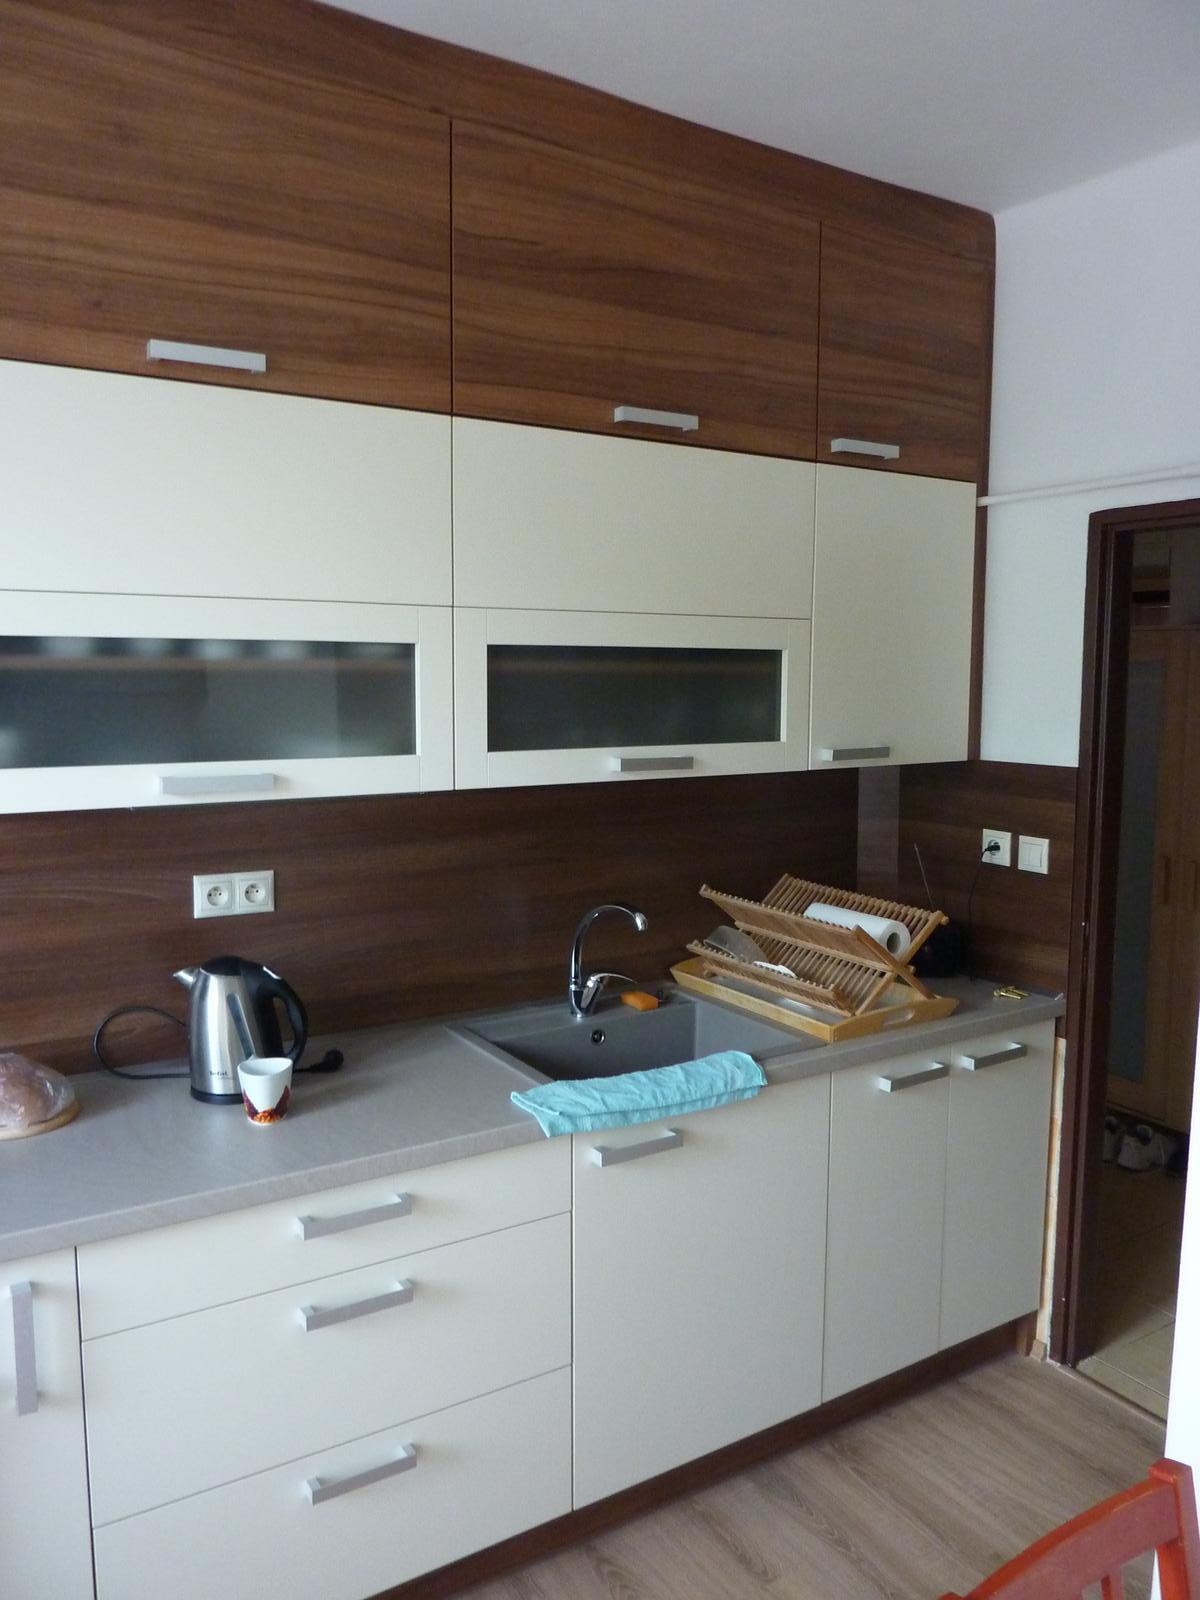 Realizácie kuchyne  - stolárstvo Valuška - Kuchynská linka robená do paneláku